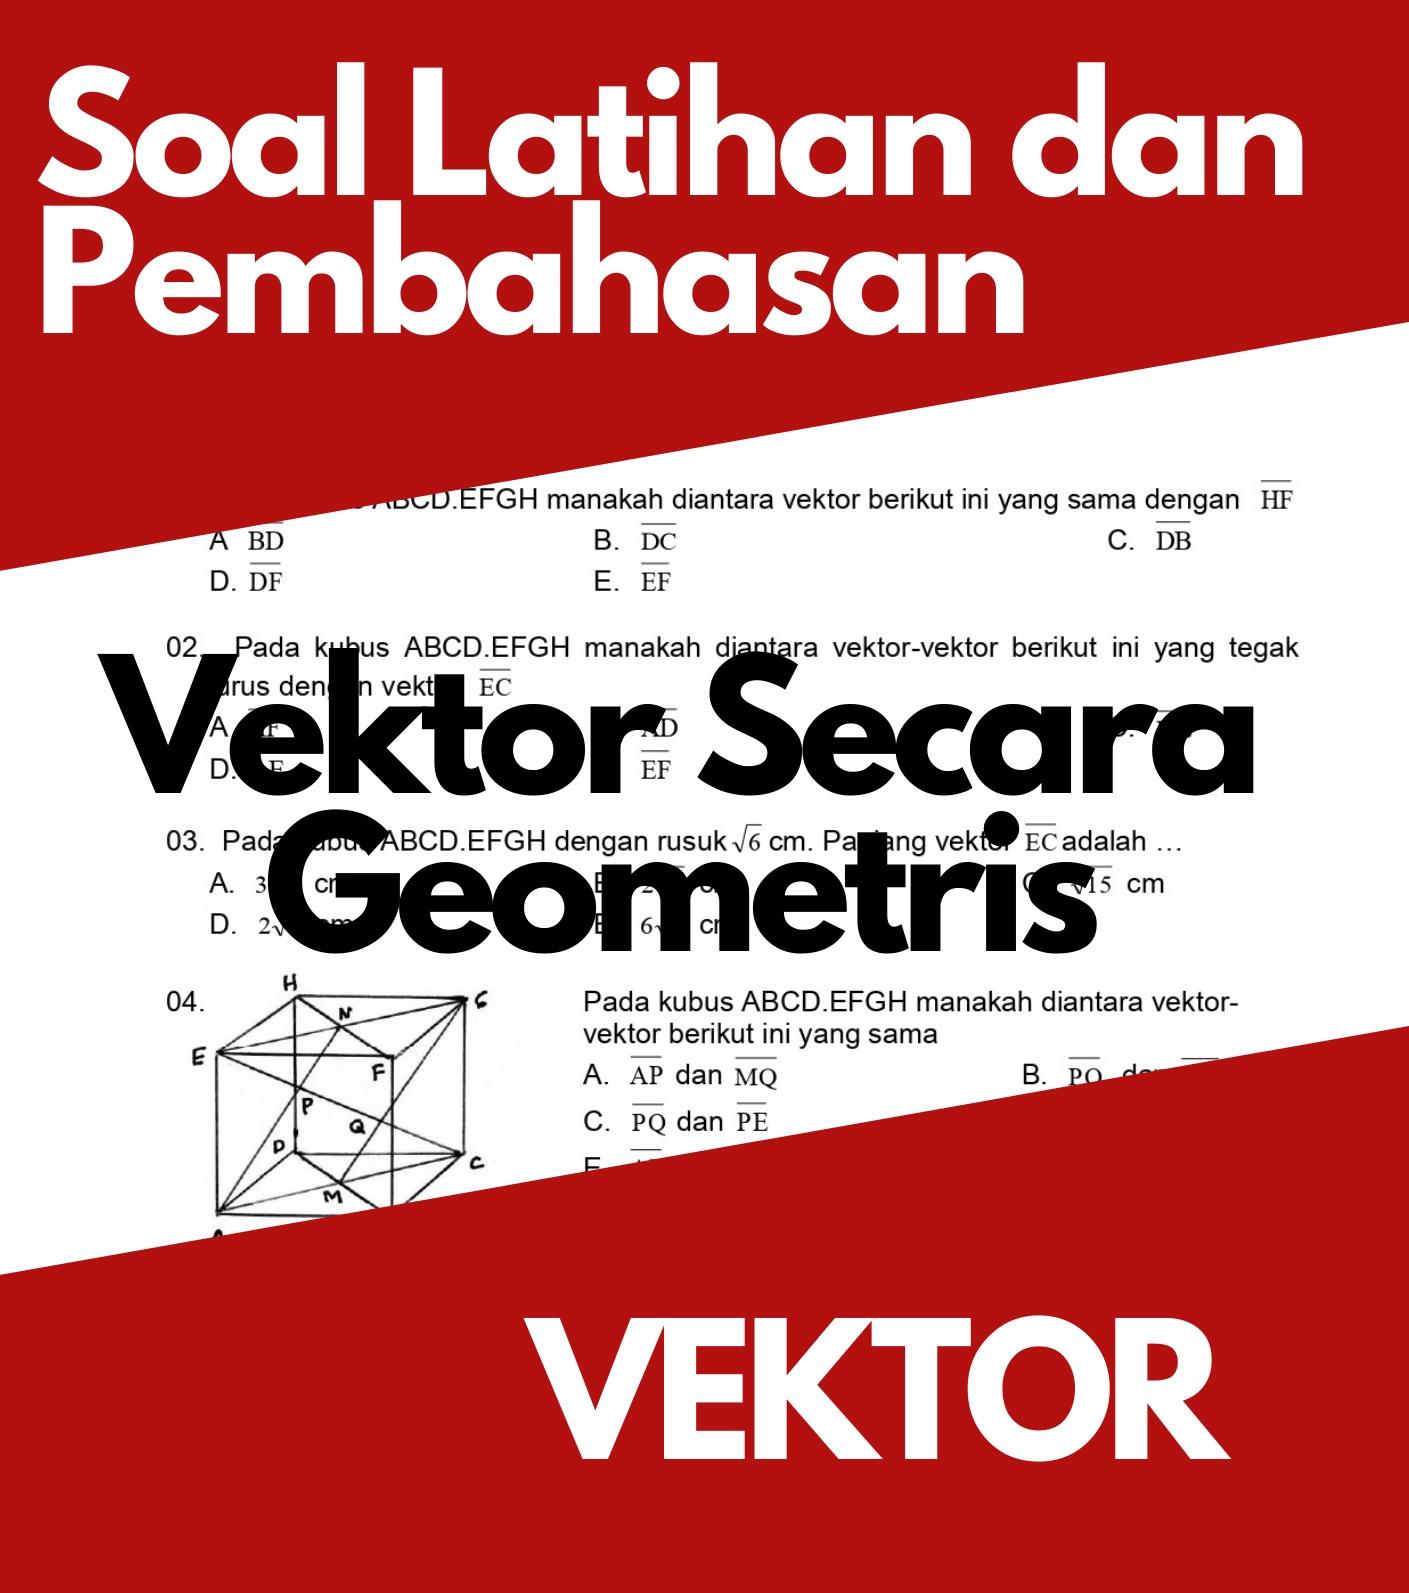 Matematika Dasar SMA: Tinjauan Vektor Secara Geometris